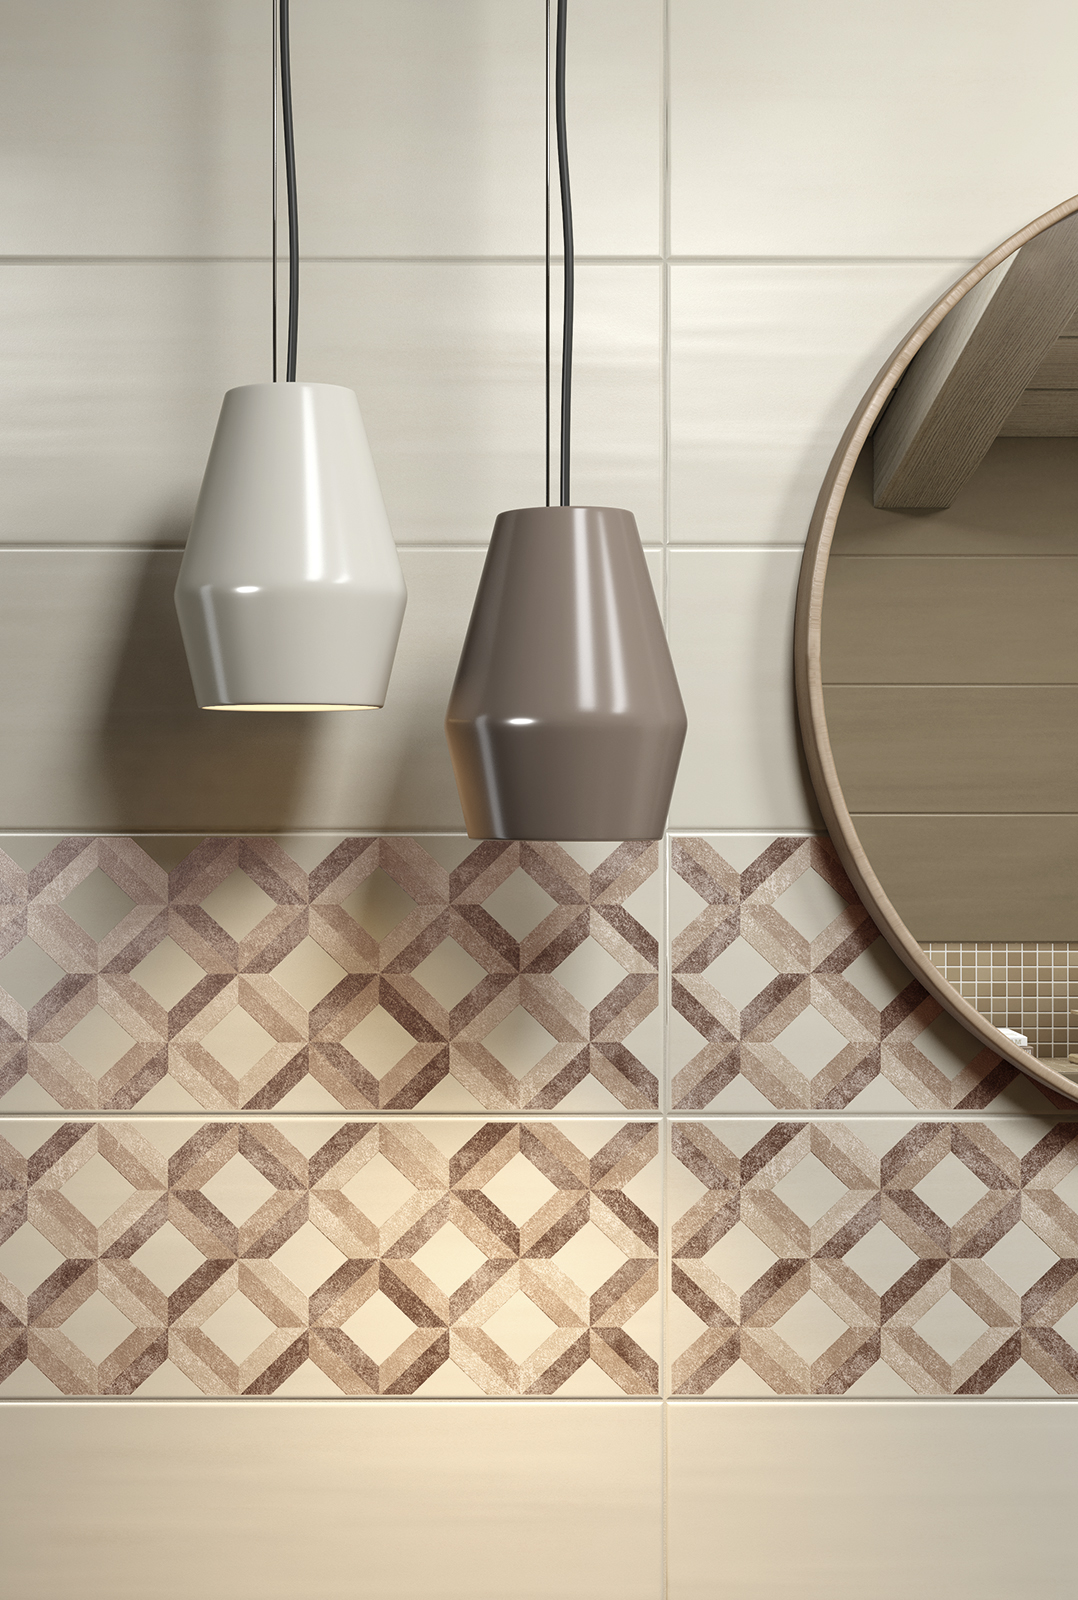 Paint kitchen and bathroom wall tiling marazzi paint ceramic tiles marazzi7072 dailygadgetfo Gallery